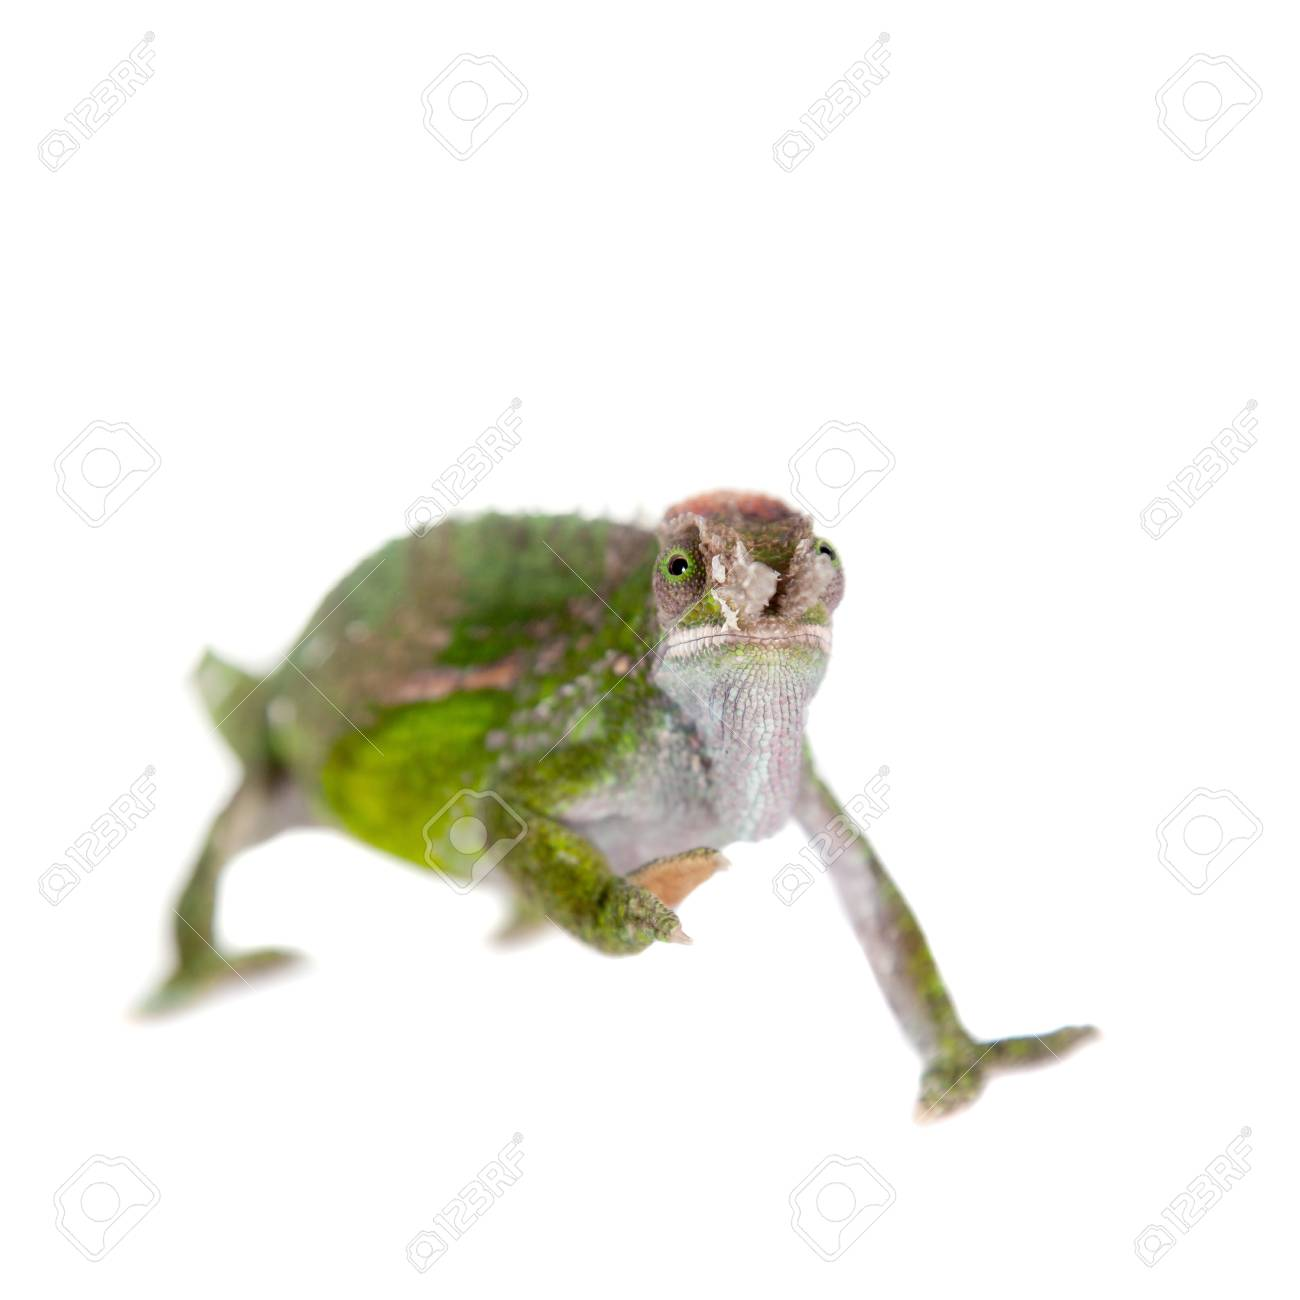 Fischers chameleon kinyongia fischeri isolated on white background fischers chameleon kinyongia fischeri isolated on white background stock photo 42610948 thecheapjerseys Images